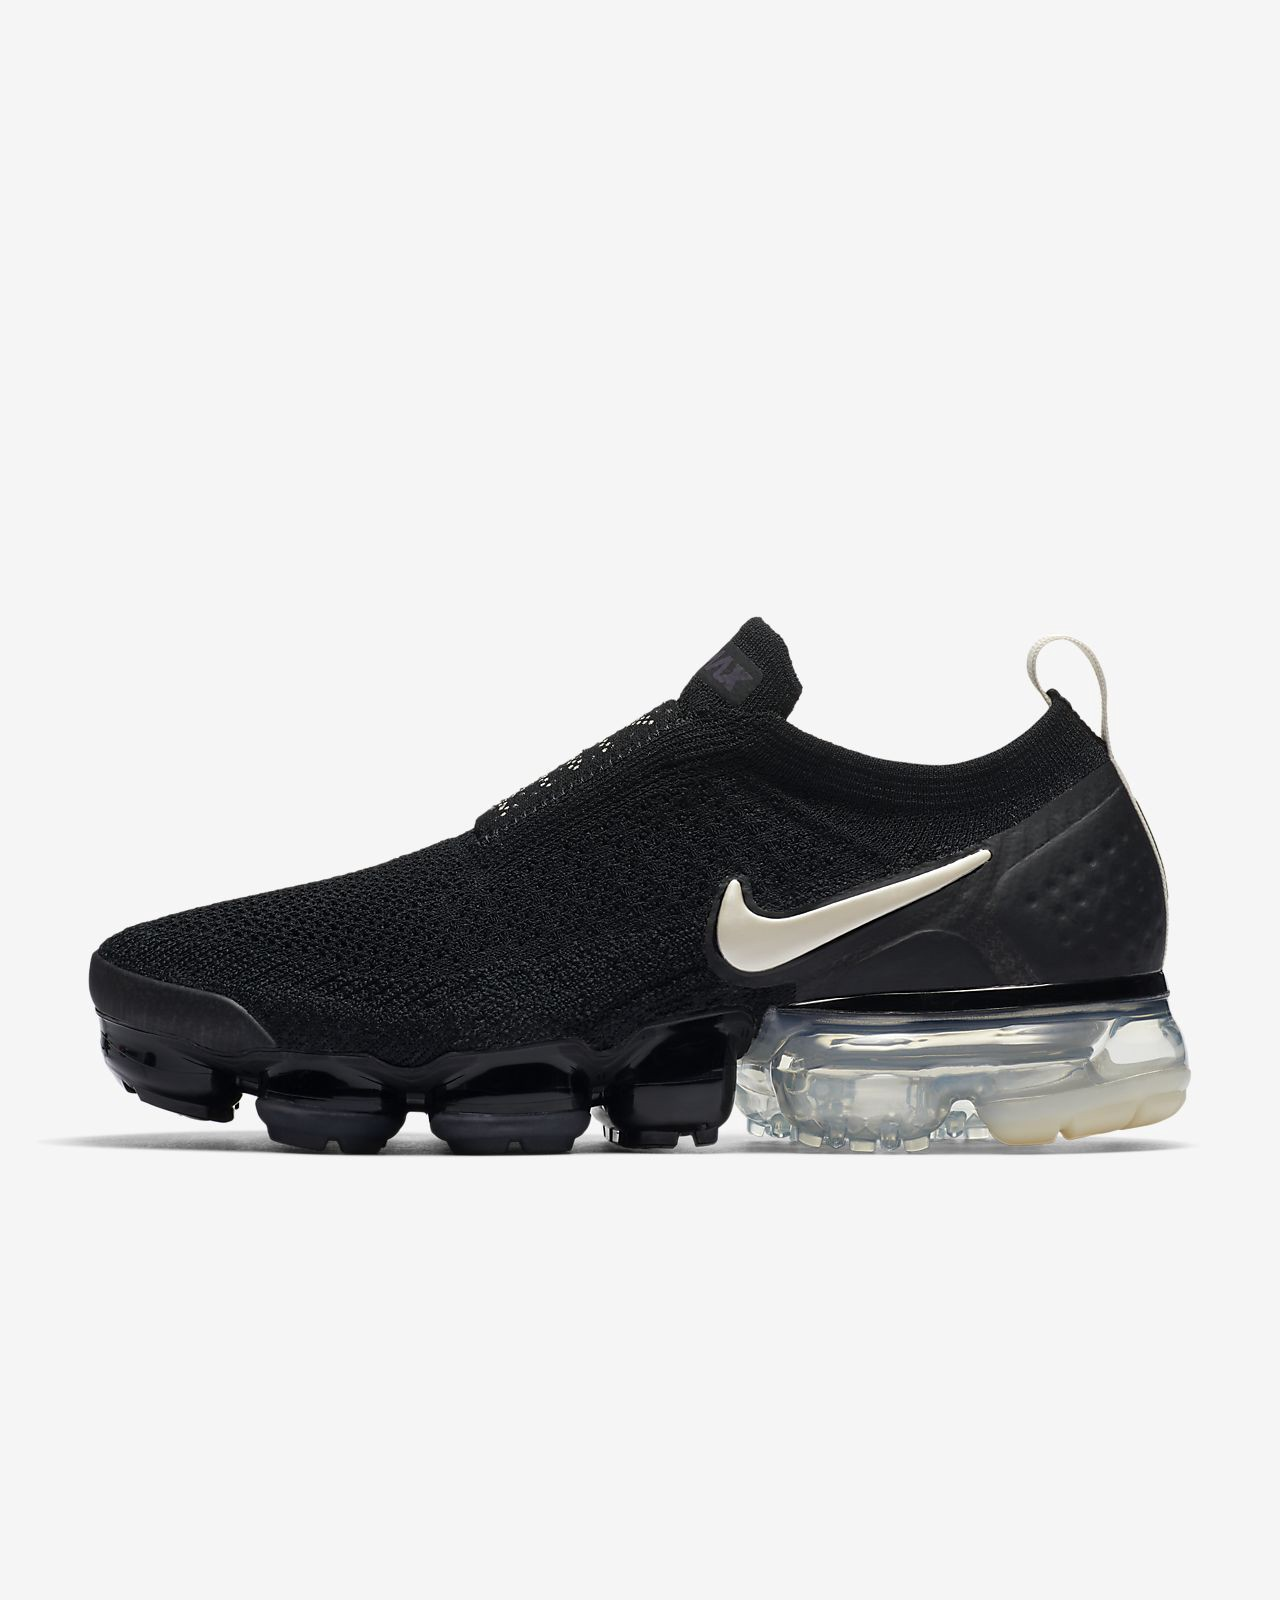 097c990354 Nike Air Vapormax Flyknit Moc 2 Women's Running Shoe - 5   Products ...